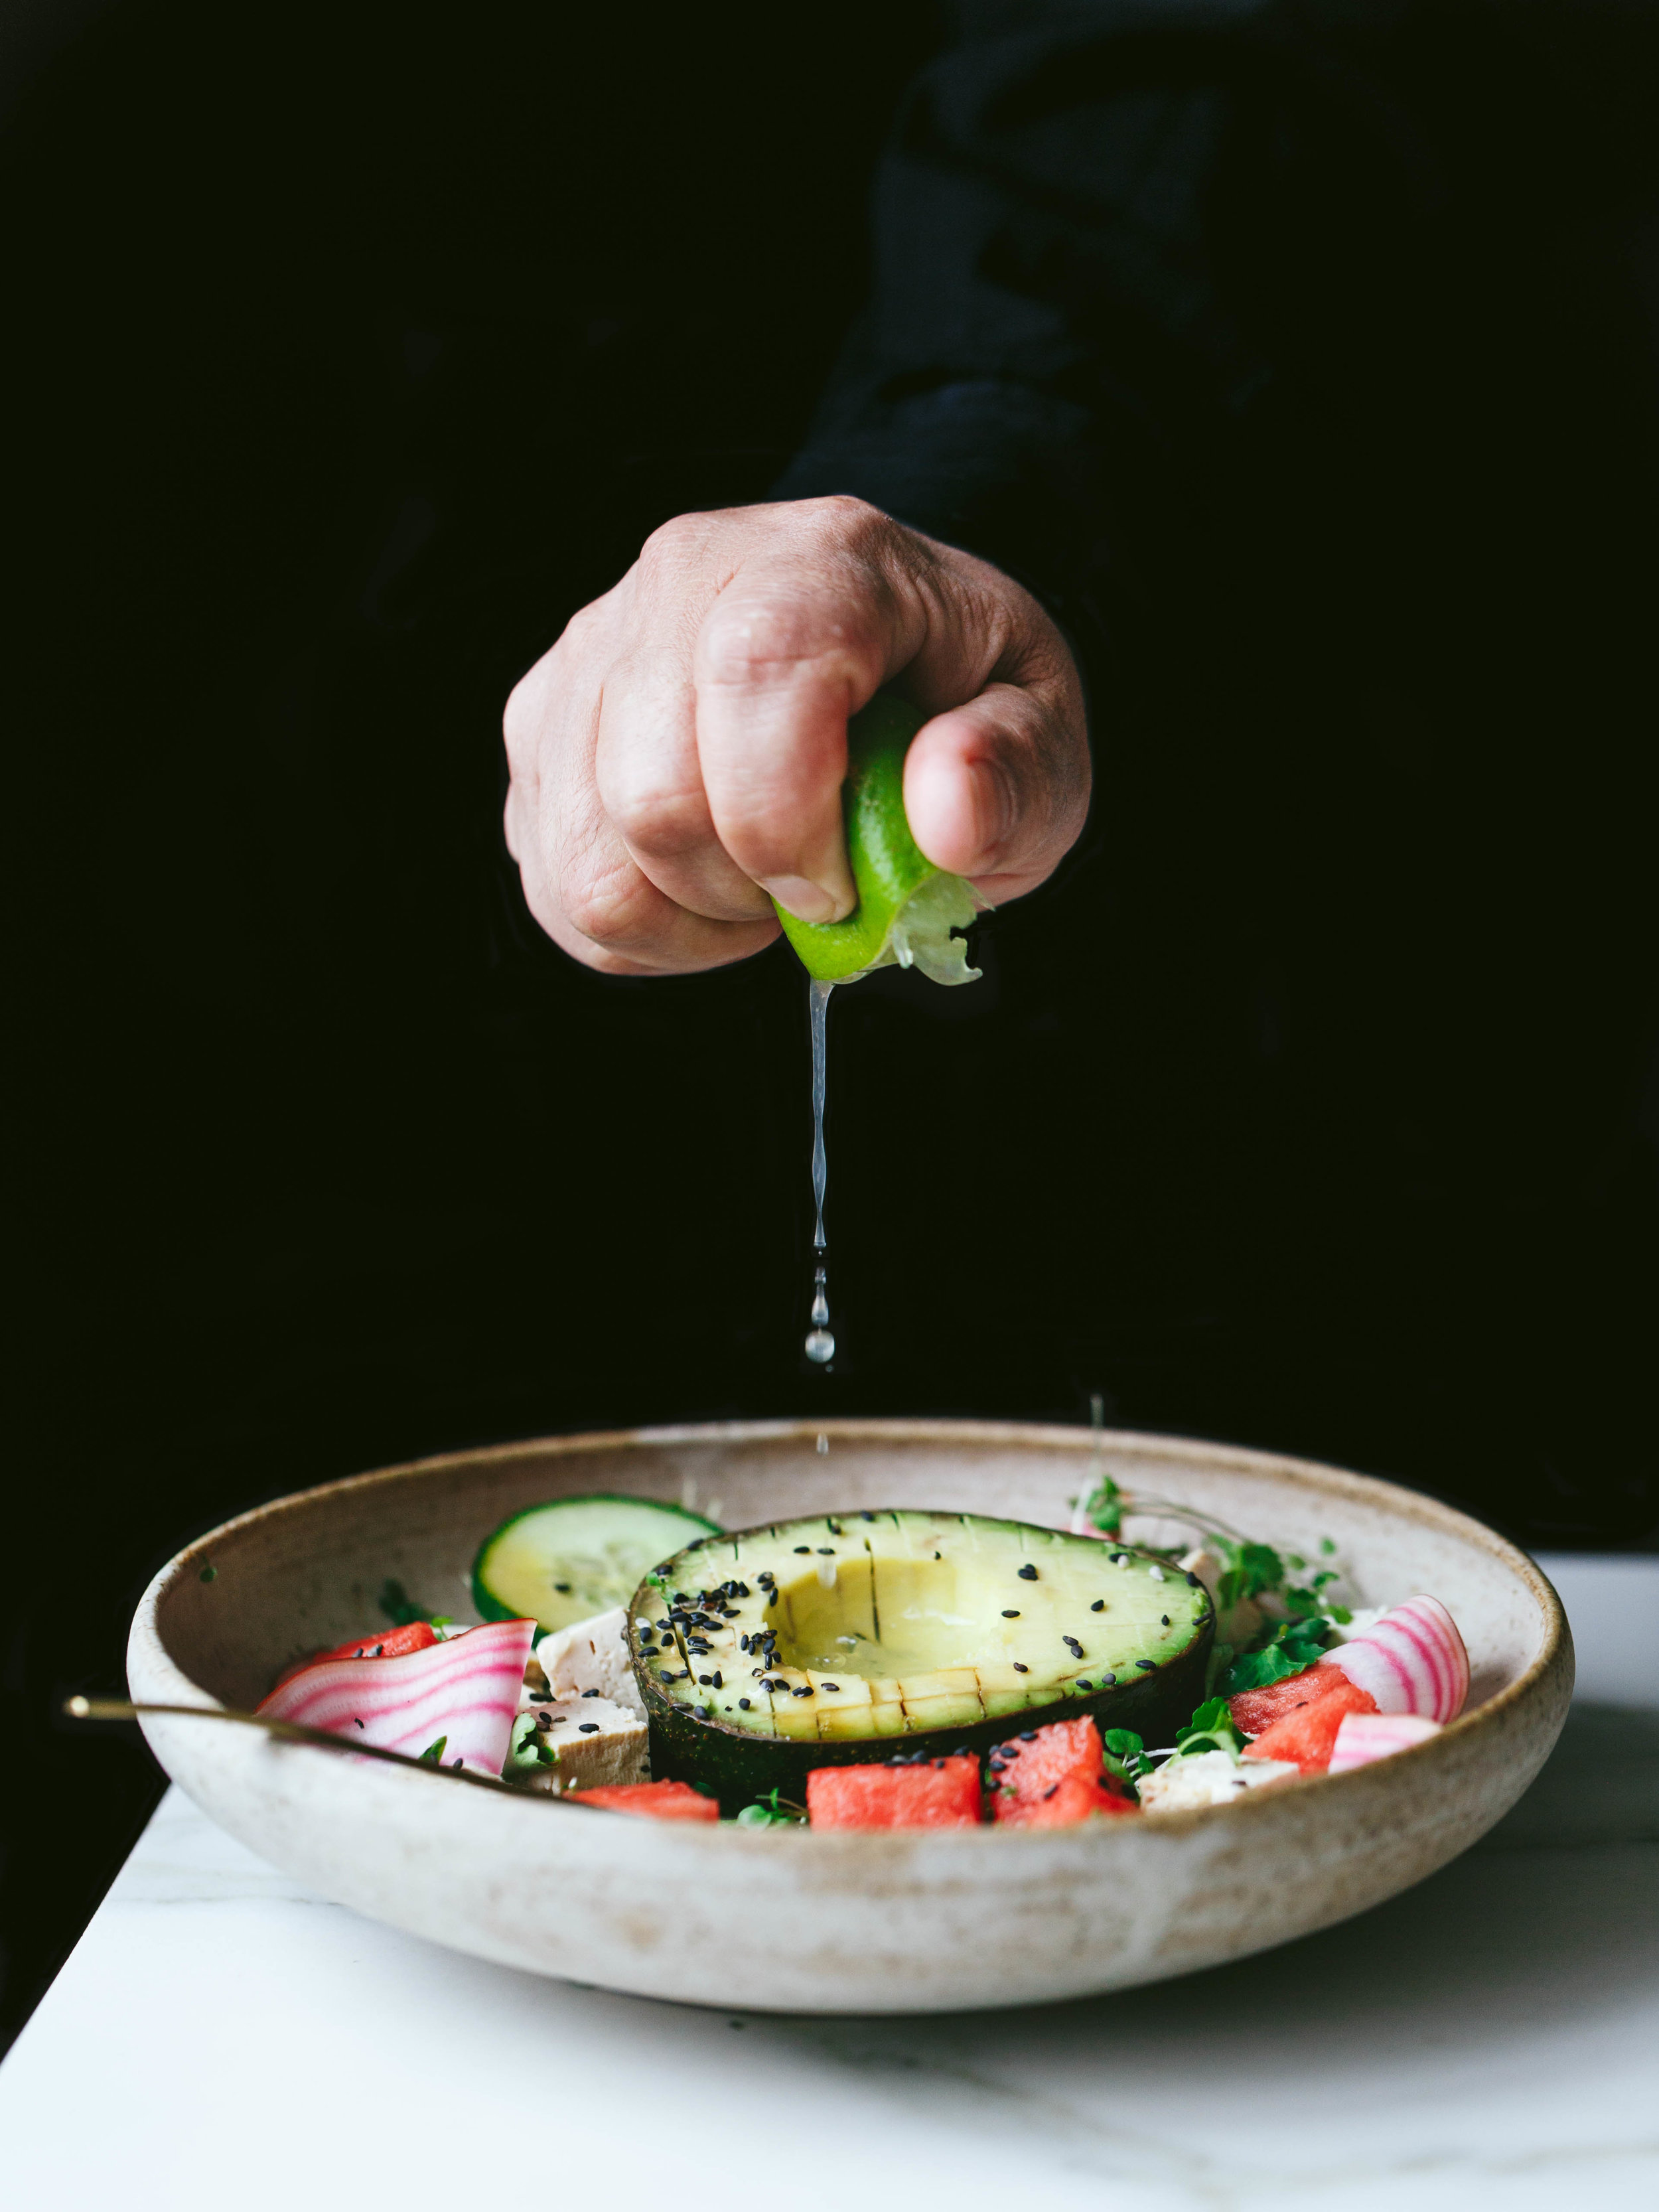 Vegan tofu avocado salad recipe - The Little Plantation